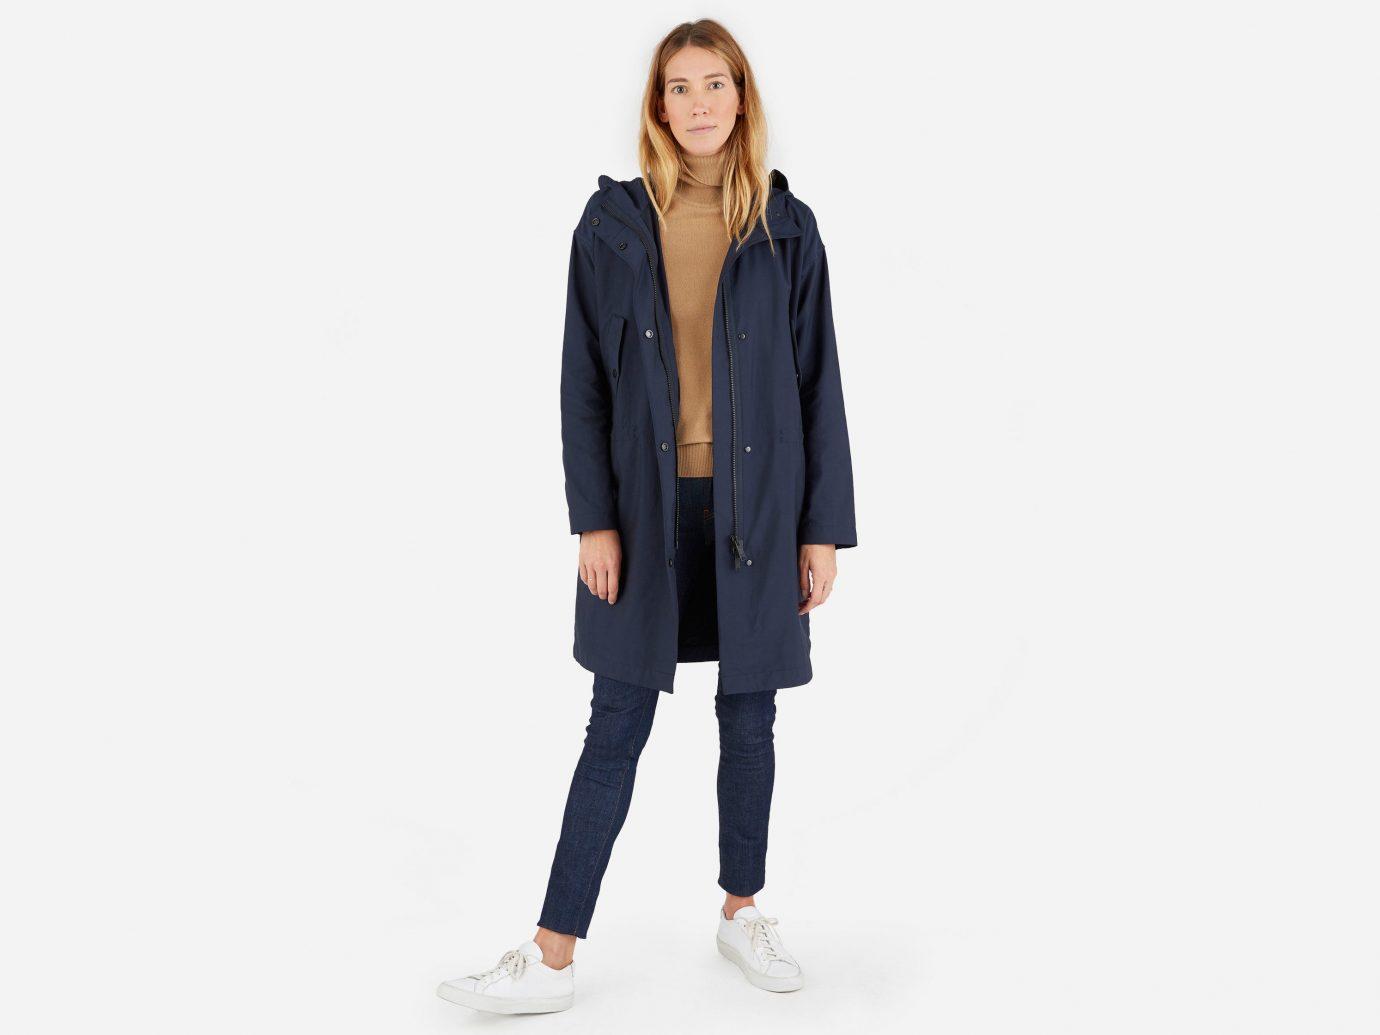 Style + Design clothing outerwear jacket suit denim standing sleeve footwear leather spring pattern textile coat blazer pocket photo shoot posing dressed trouser